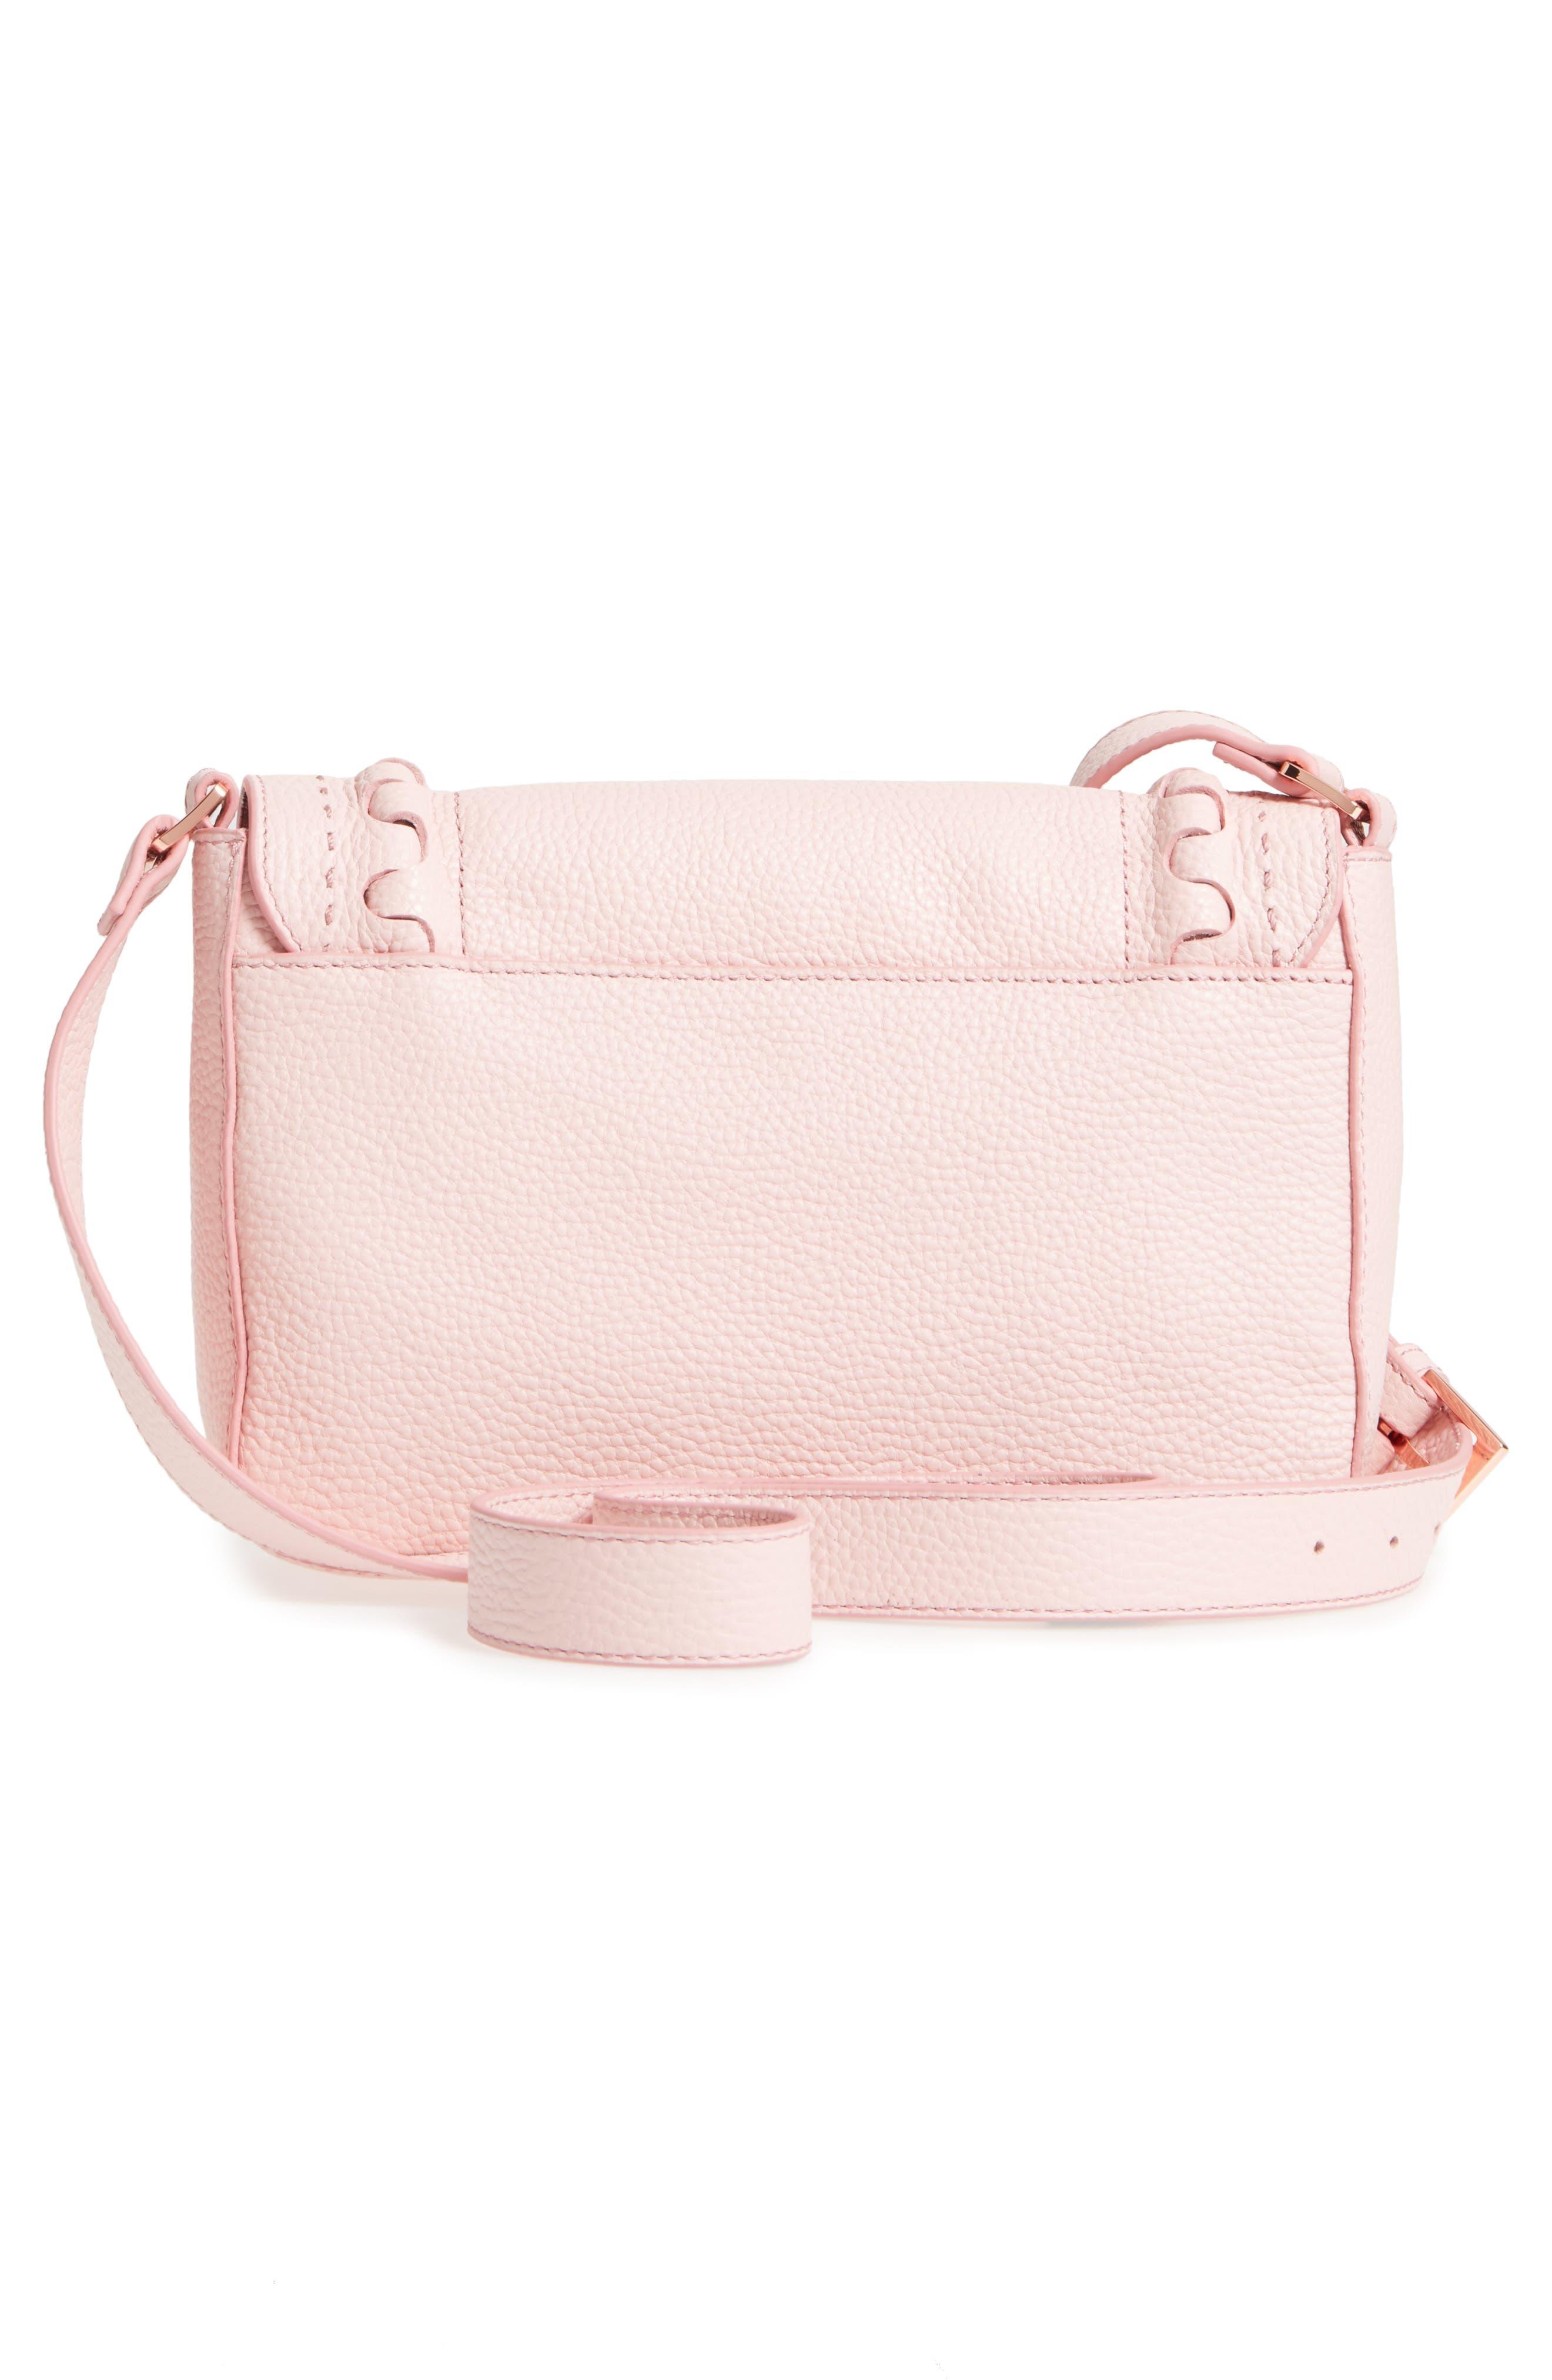 Tippi Leather Crossbody Bag,                             Alternate thumbnail 9, color,